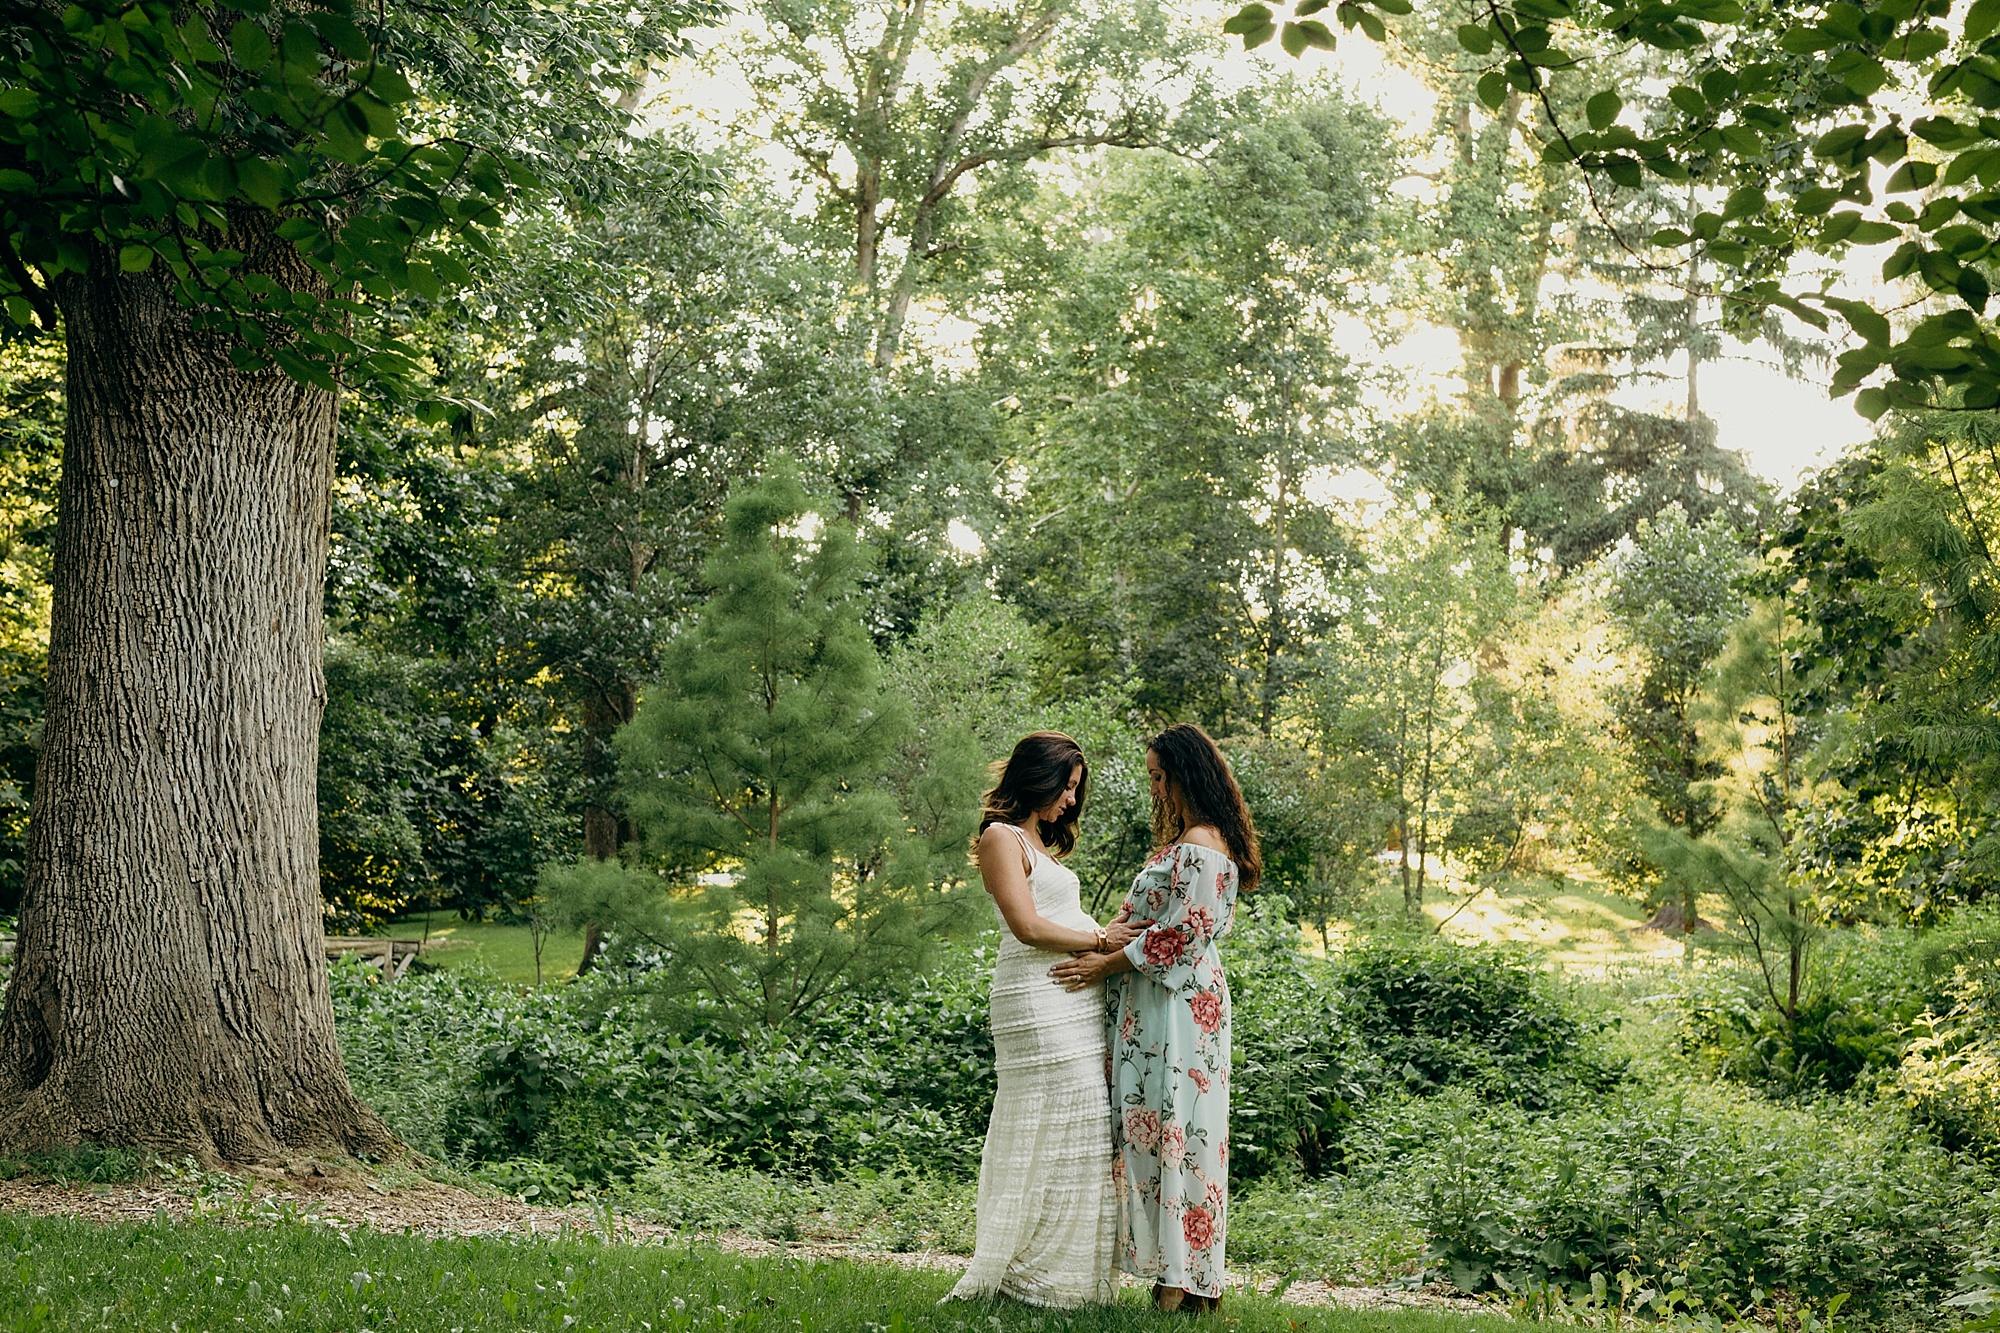 Joe_Mac_Creative_Maternity_West_Chester_Wedding_Photography_Philly_Best_Philadlephia__0163.jpg